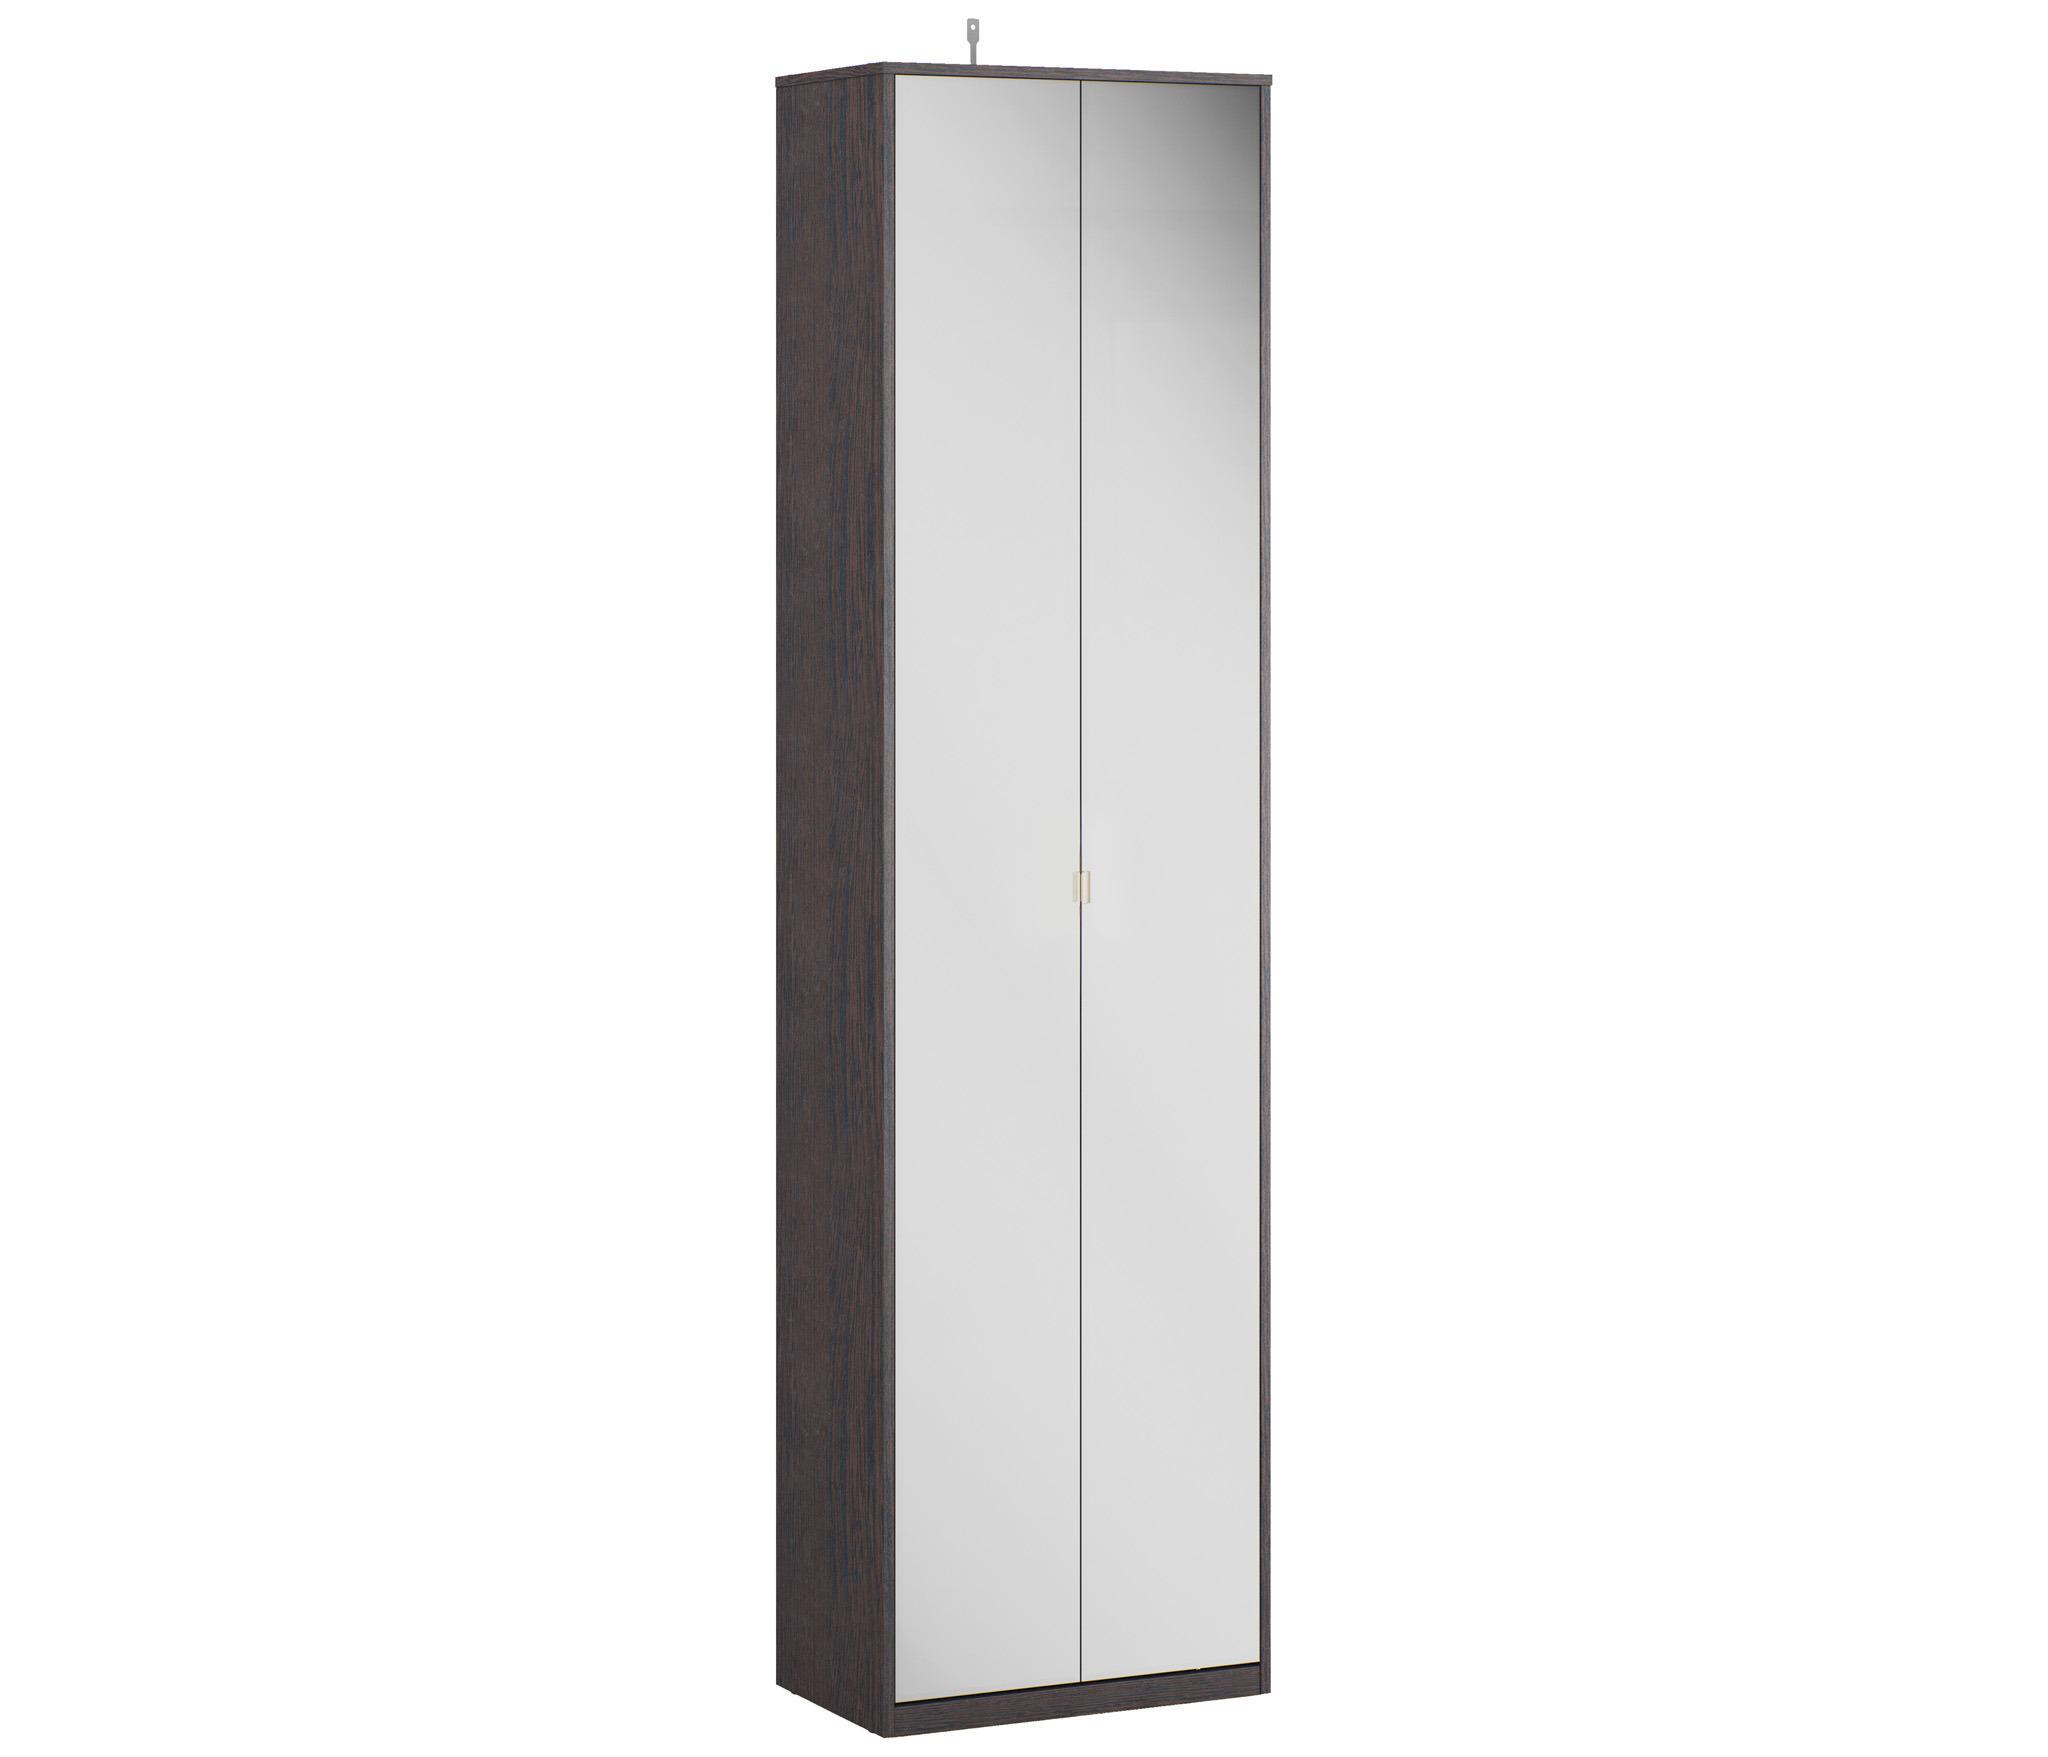 Афина СБ-2231 Шкаф 2-х дверный с зеркалом